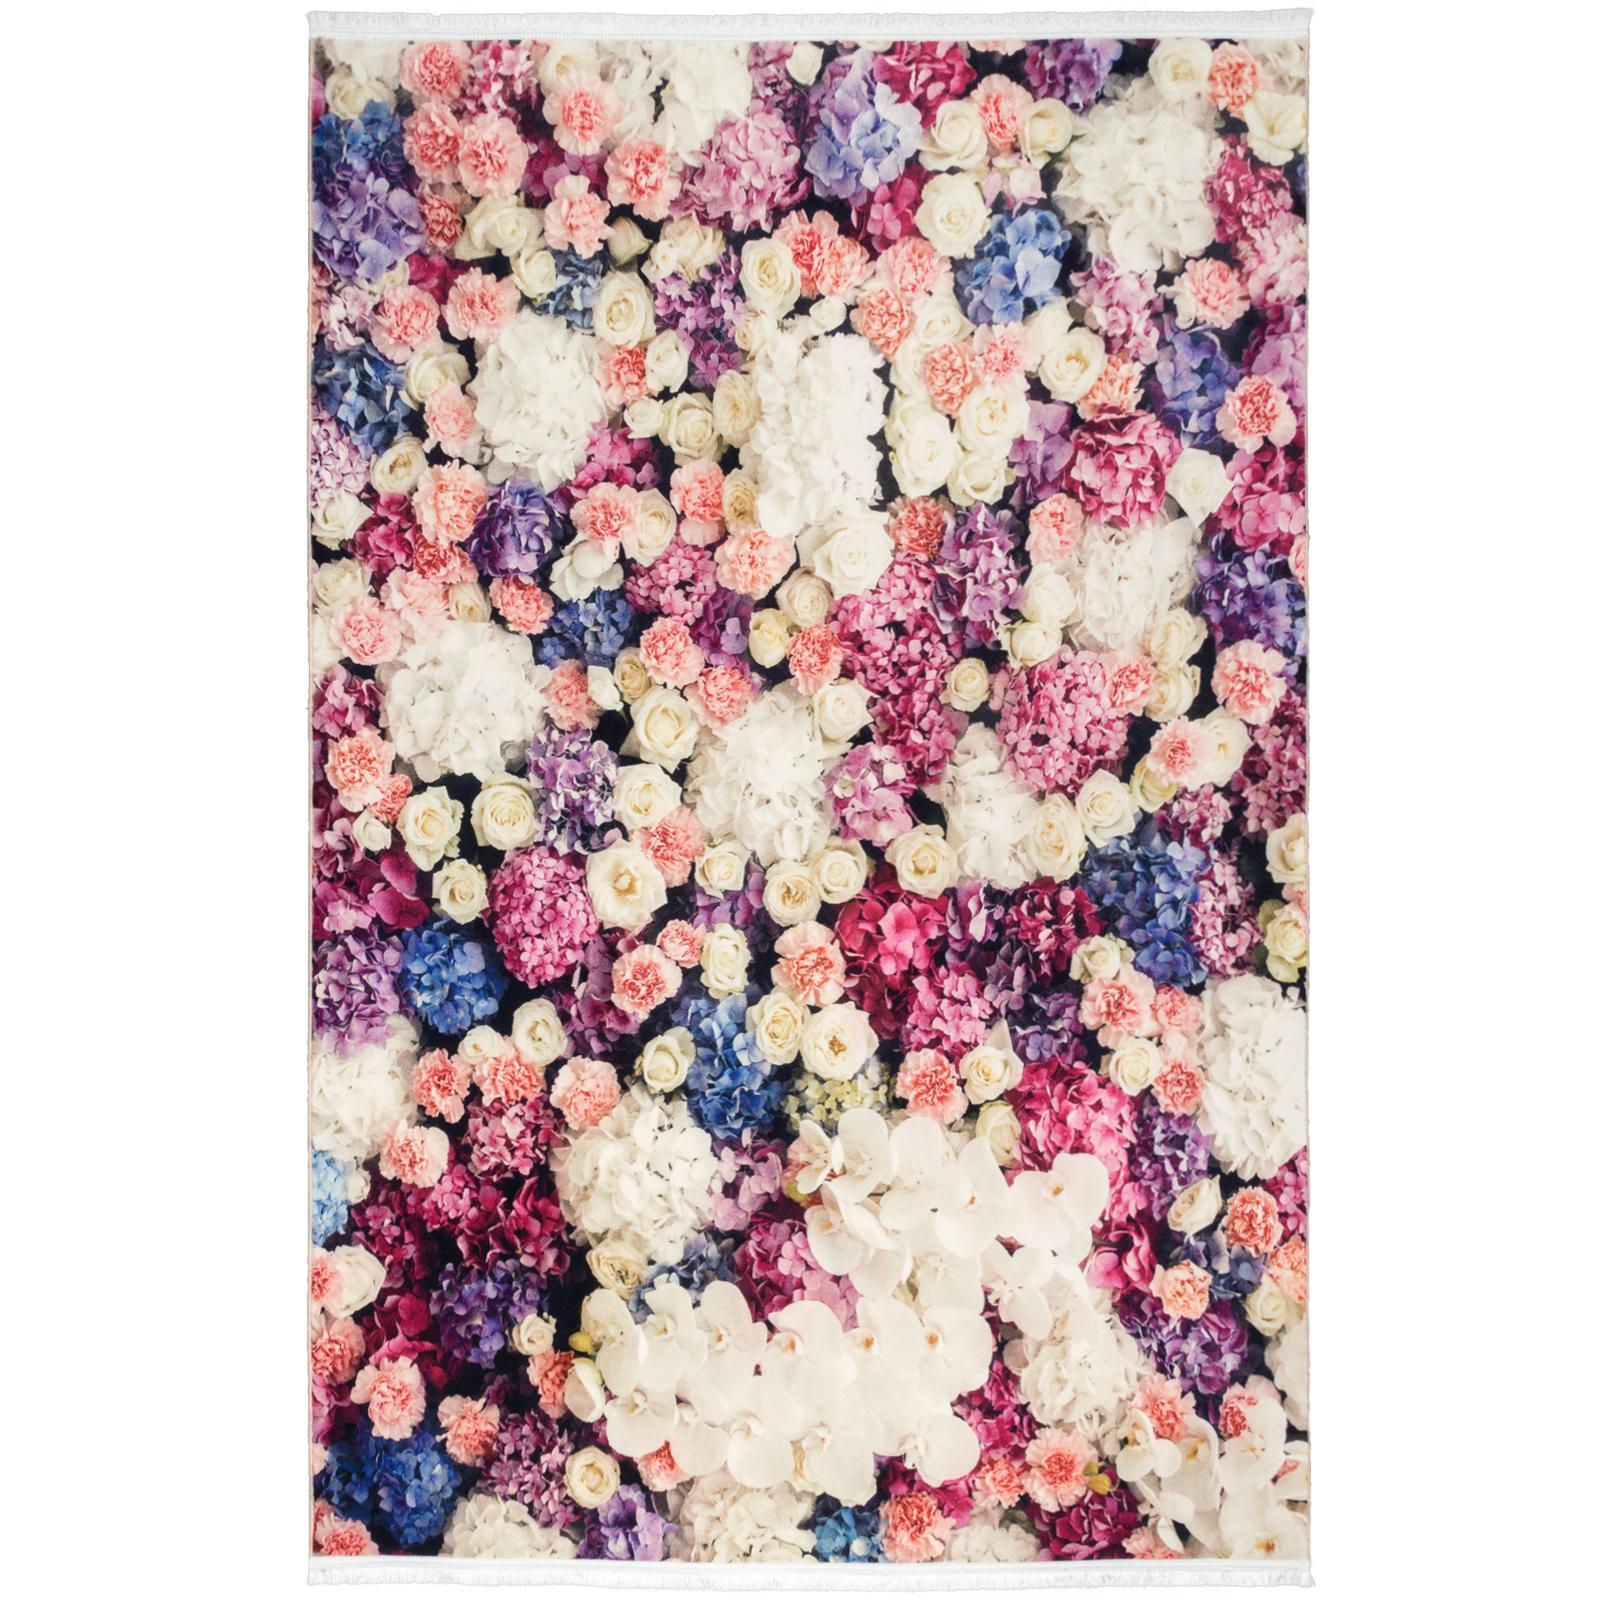 فرش ماشینی محتشم طرح گل کد 100445